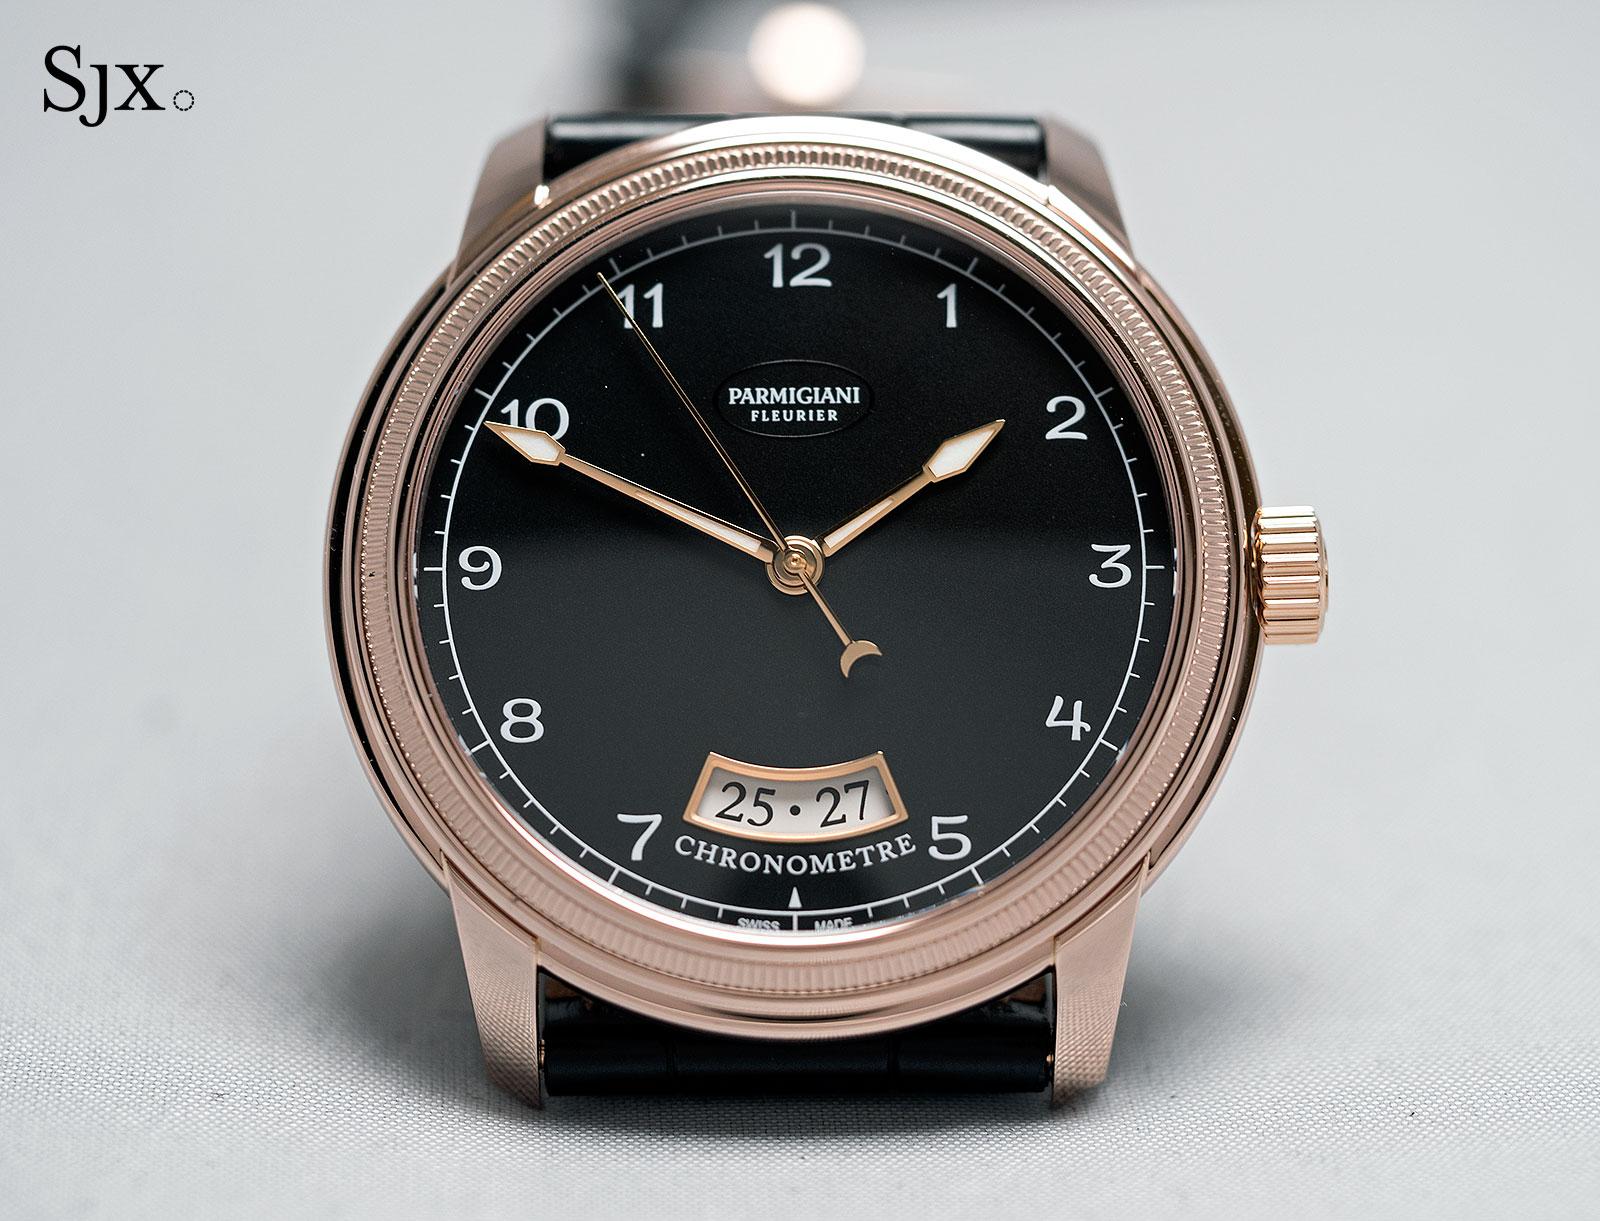 Parmigiani Toric Chronometre red gold 1